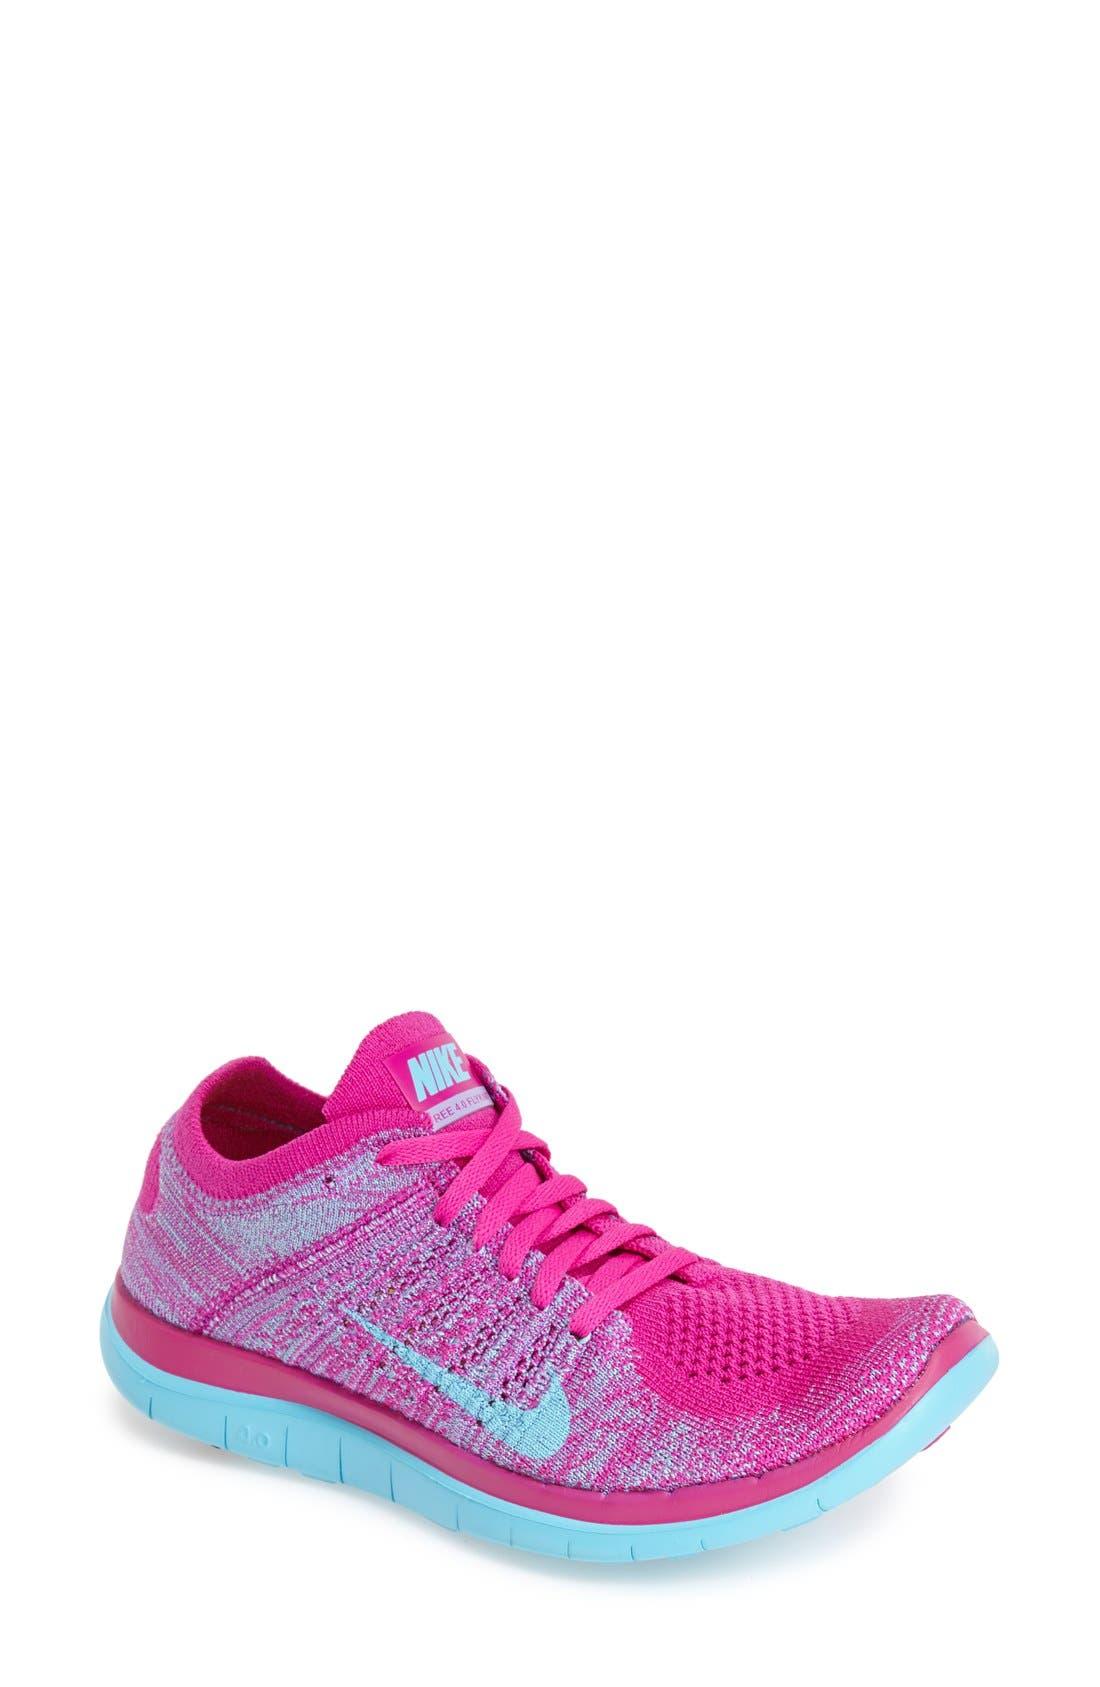 Alternate Image 1 Selected - Nike 'Free 4.0 Flyknit' Running Shoe (Women)